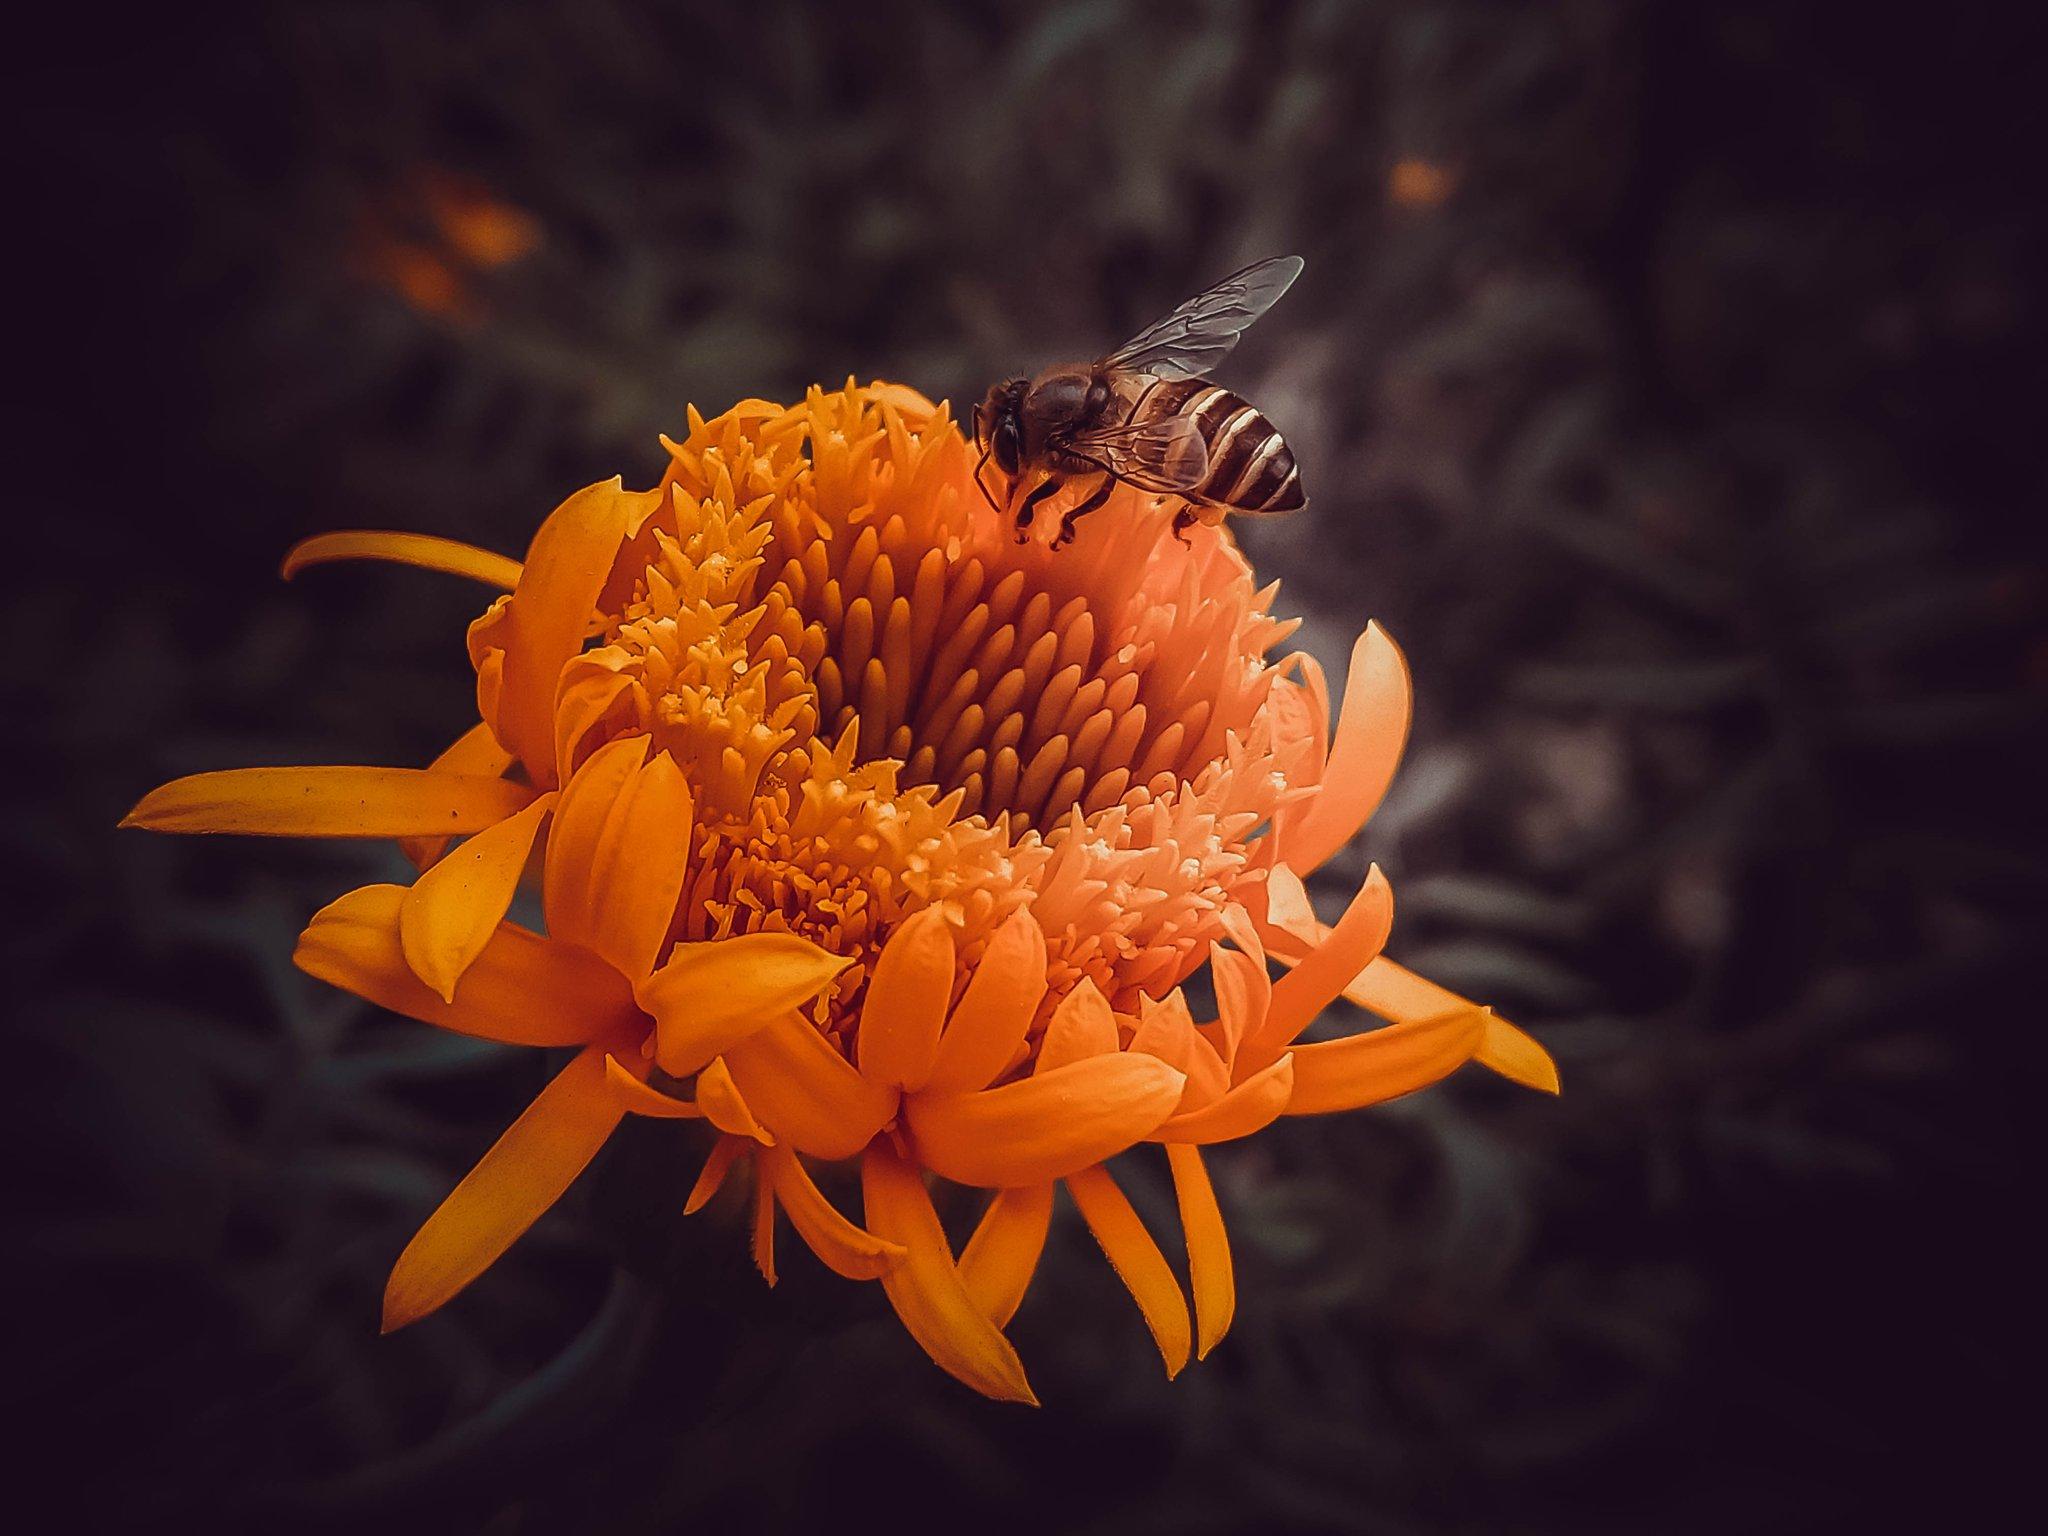 macro_photography_30.jpg